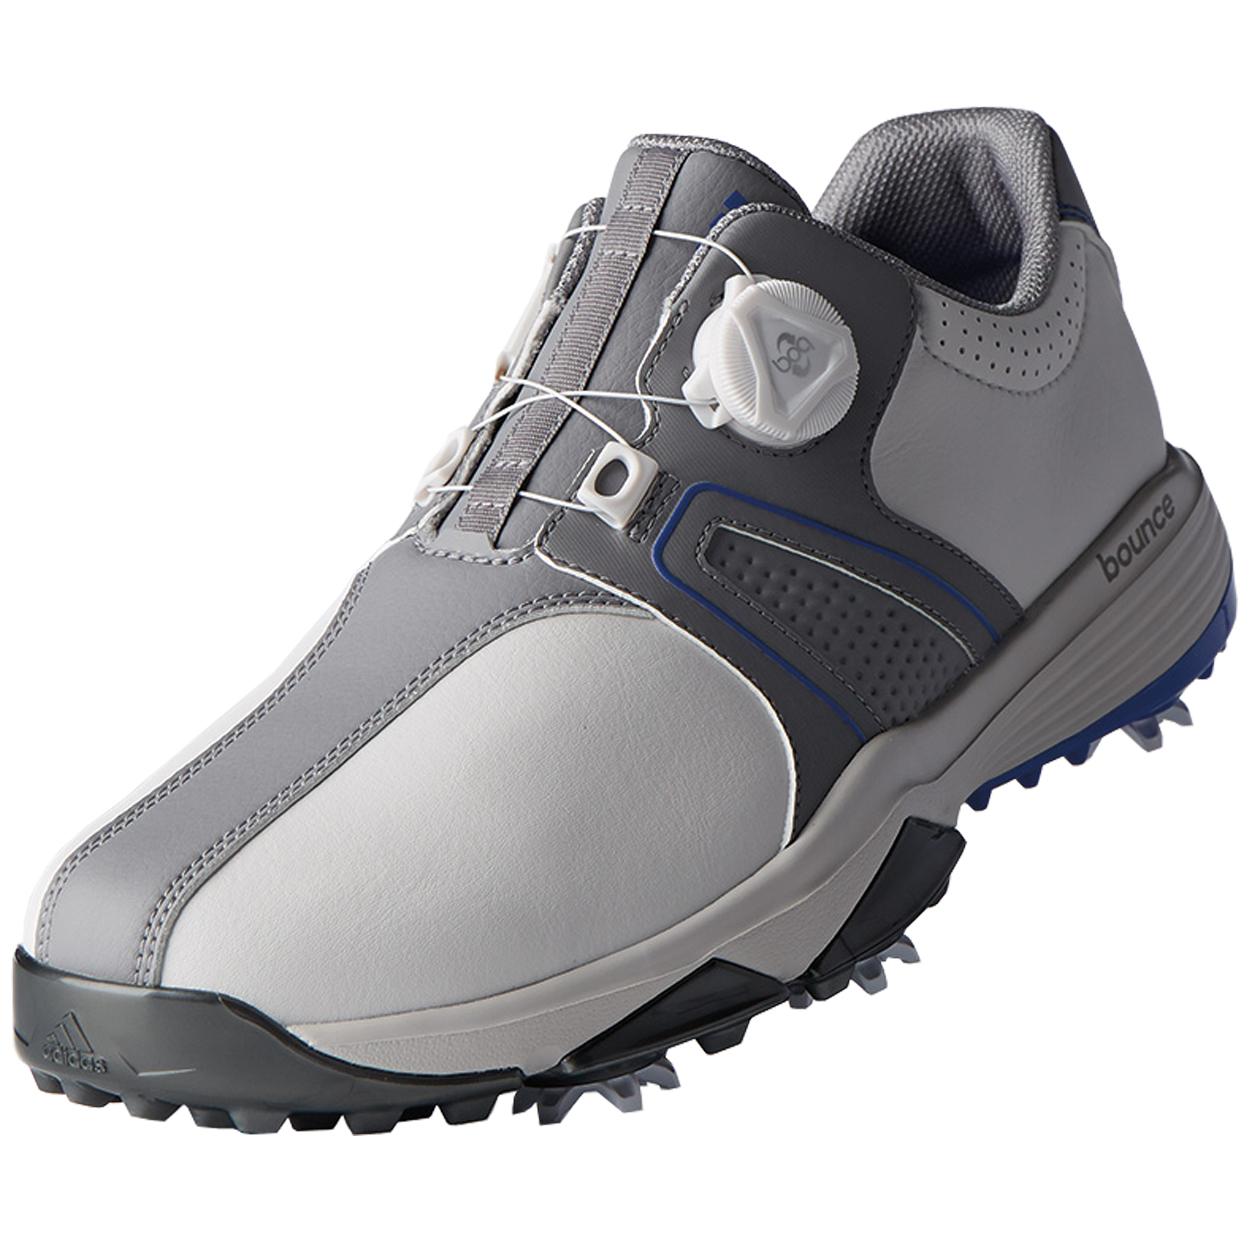 1e8cff703 Adidas 360 Traxion Golf Shoes with Boa Closure - GolfEtail.com